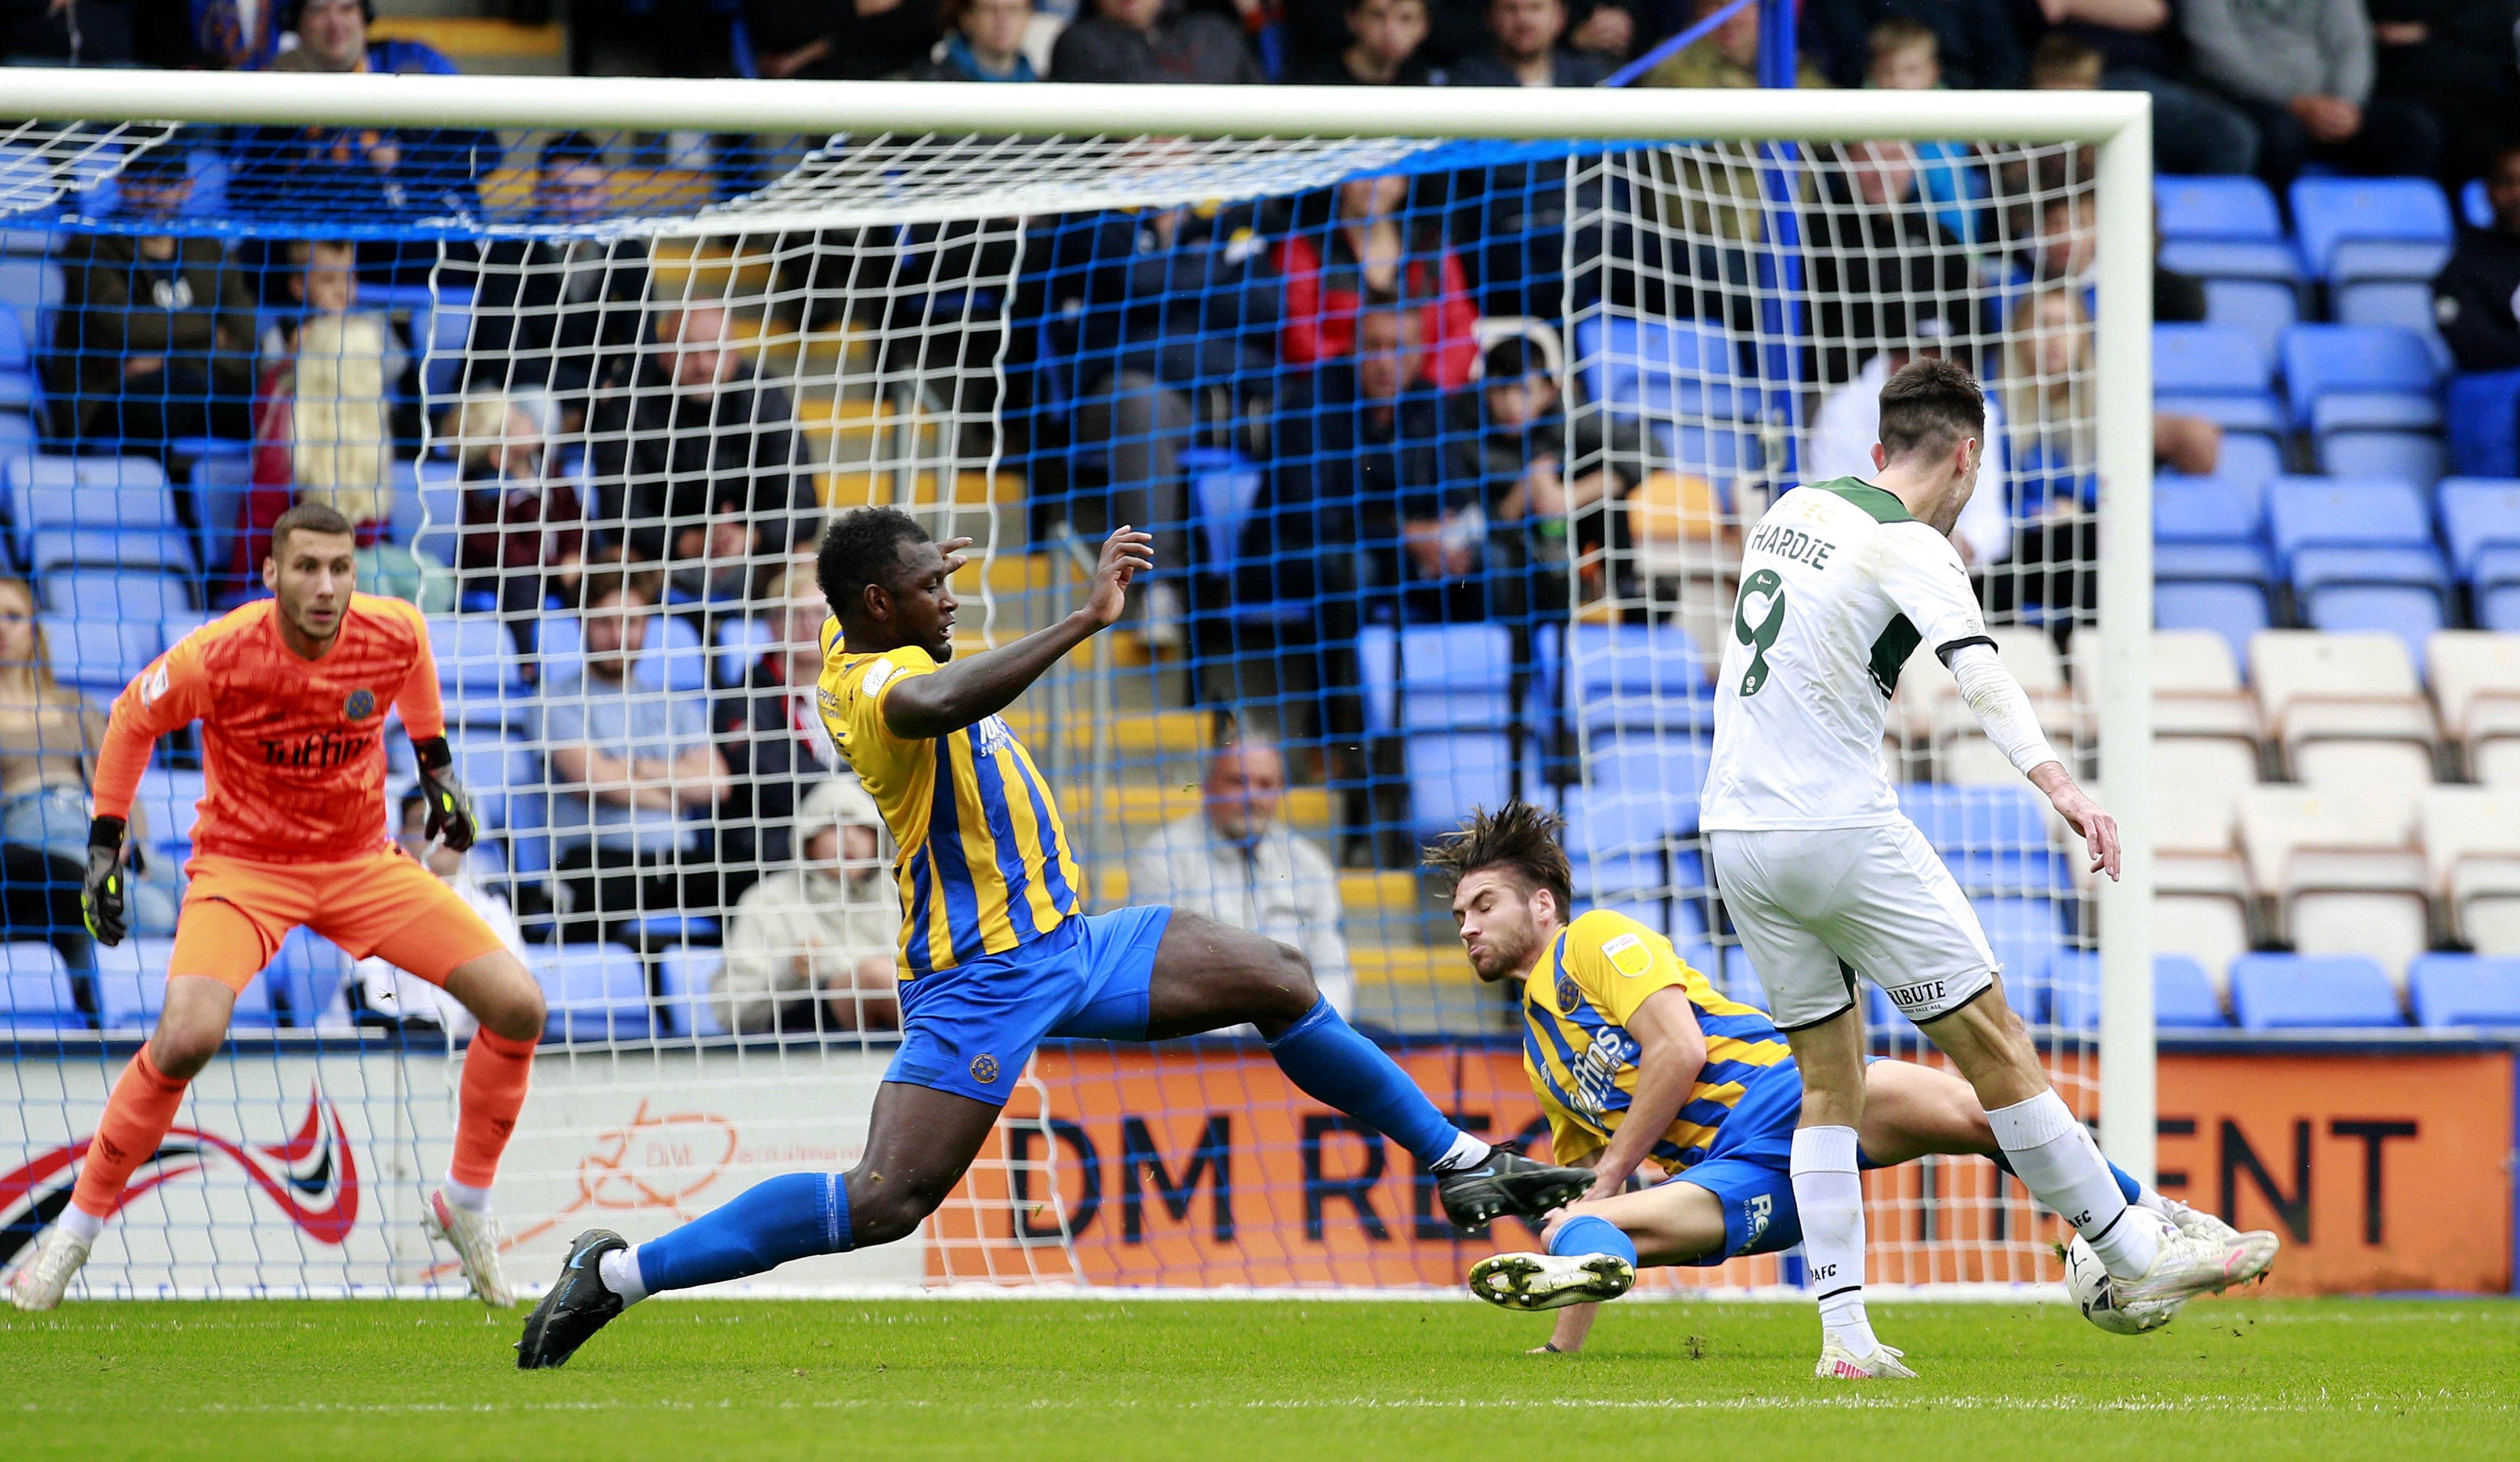 Hardie opens the scoring at Shrewsbury